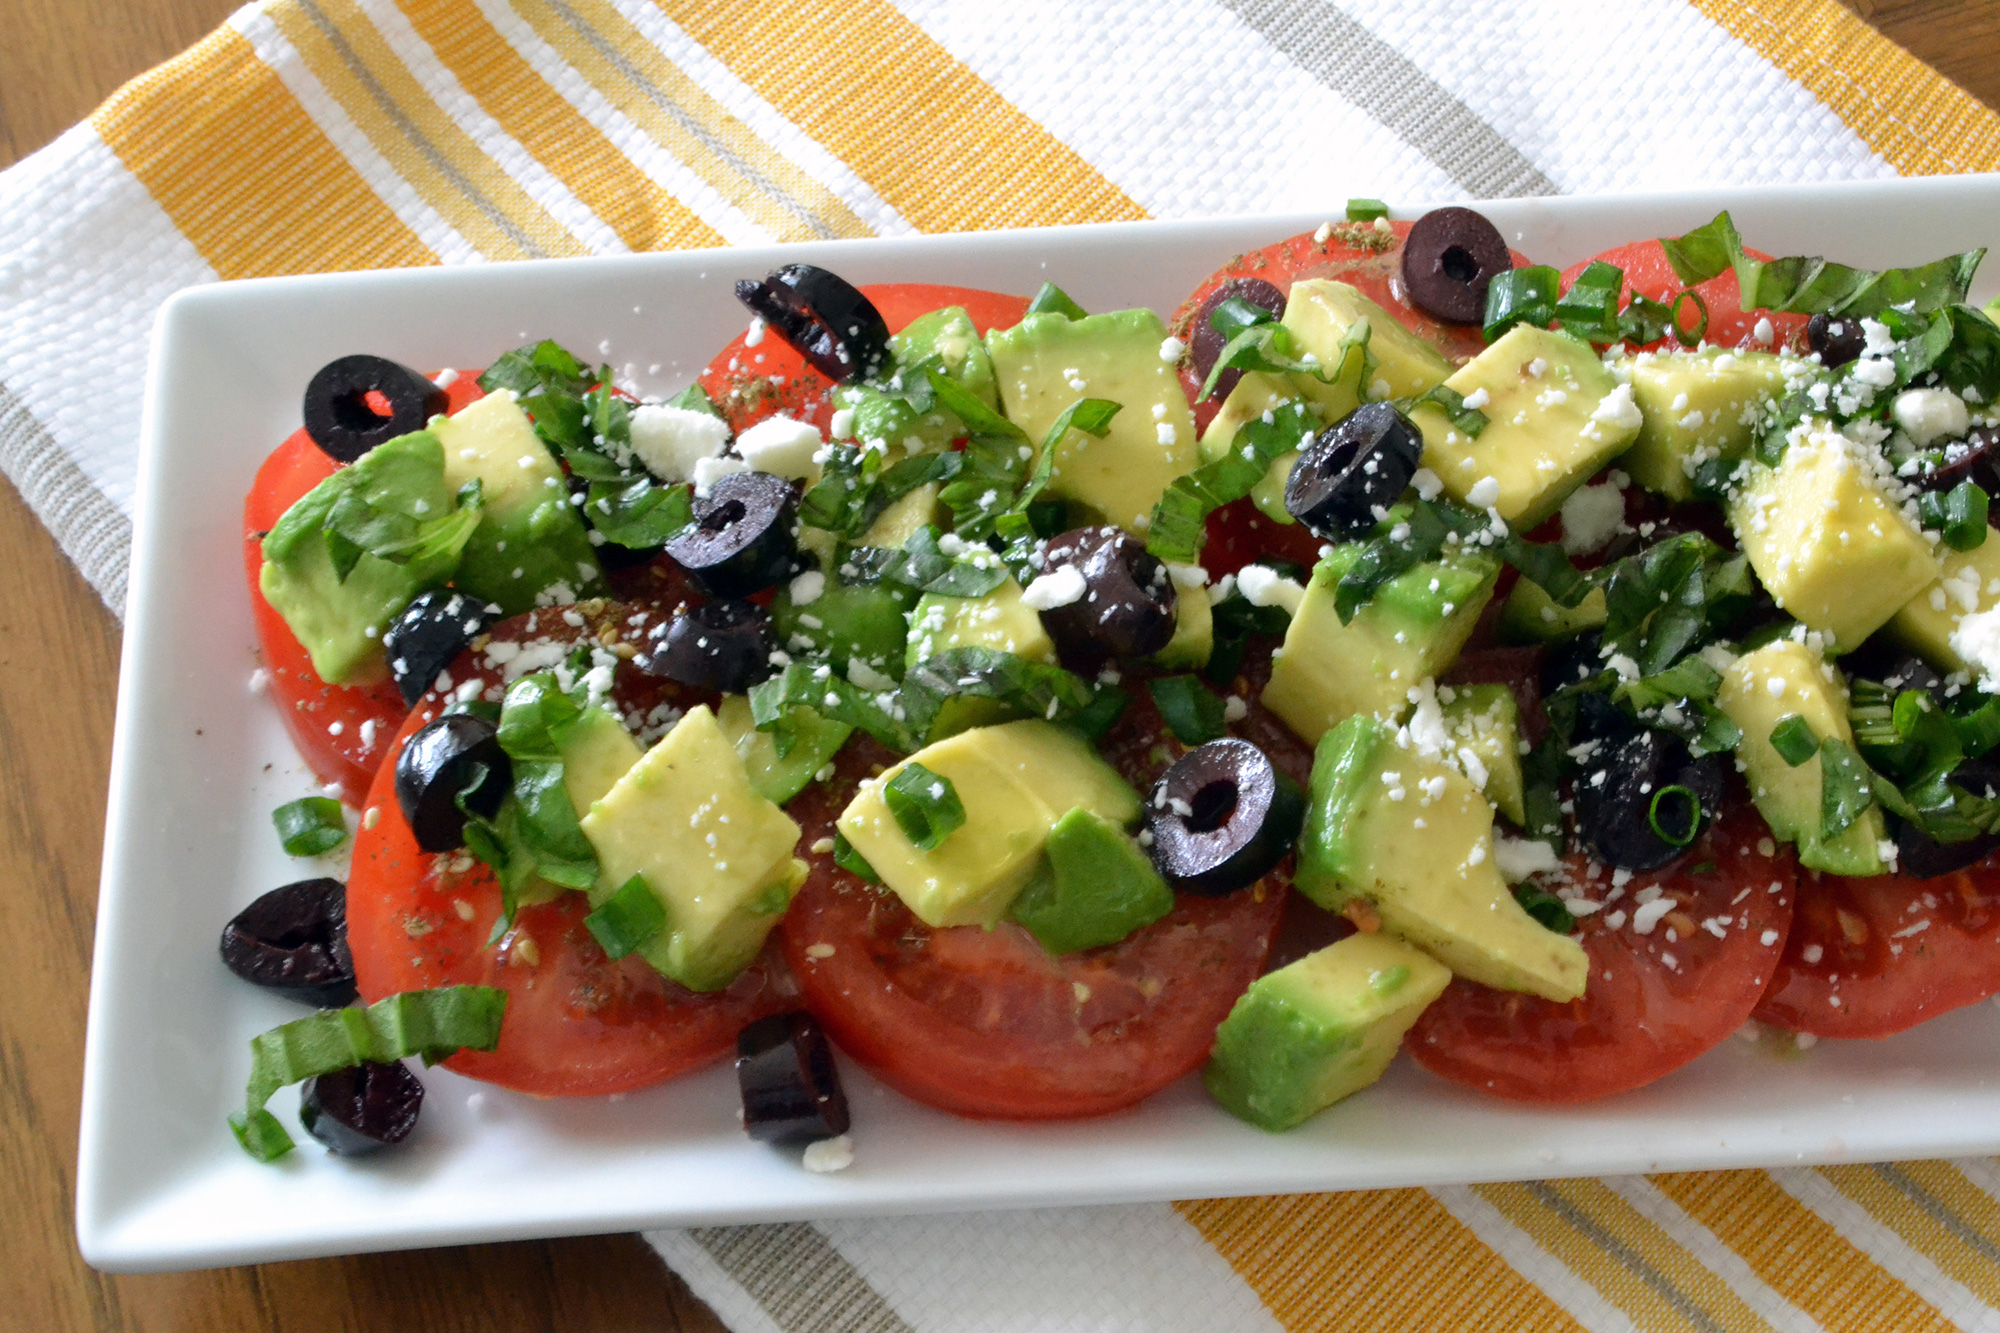 Tomato-and-Avocado-Salad-a